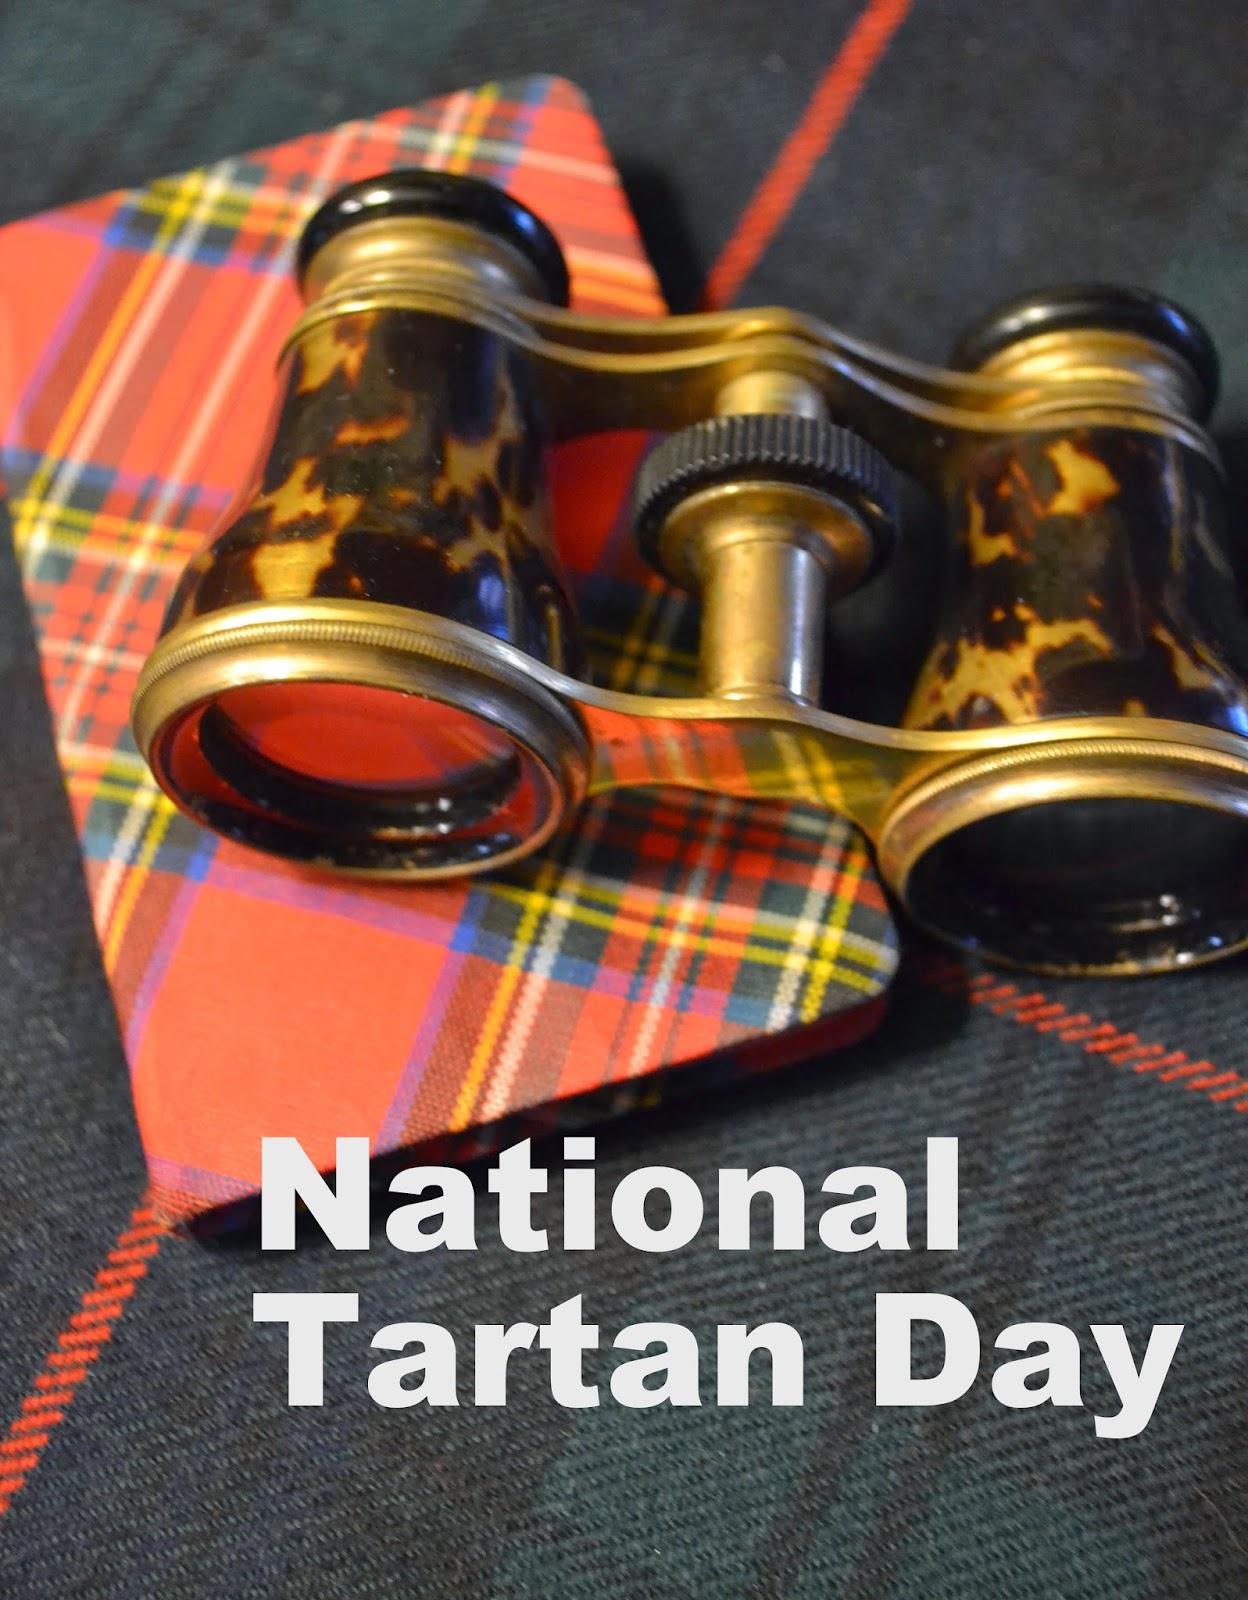 The Polohouse National Tartan Day